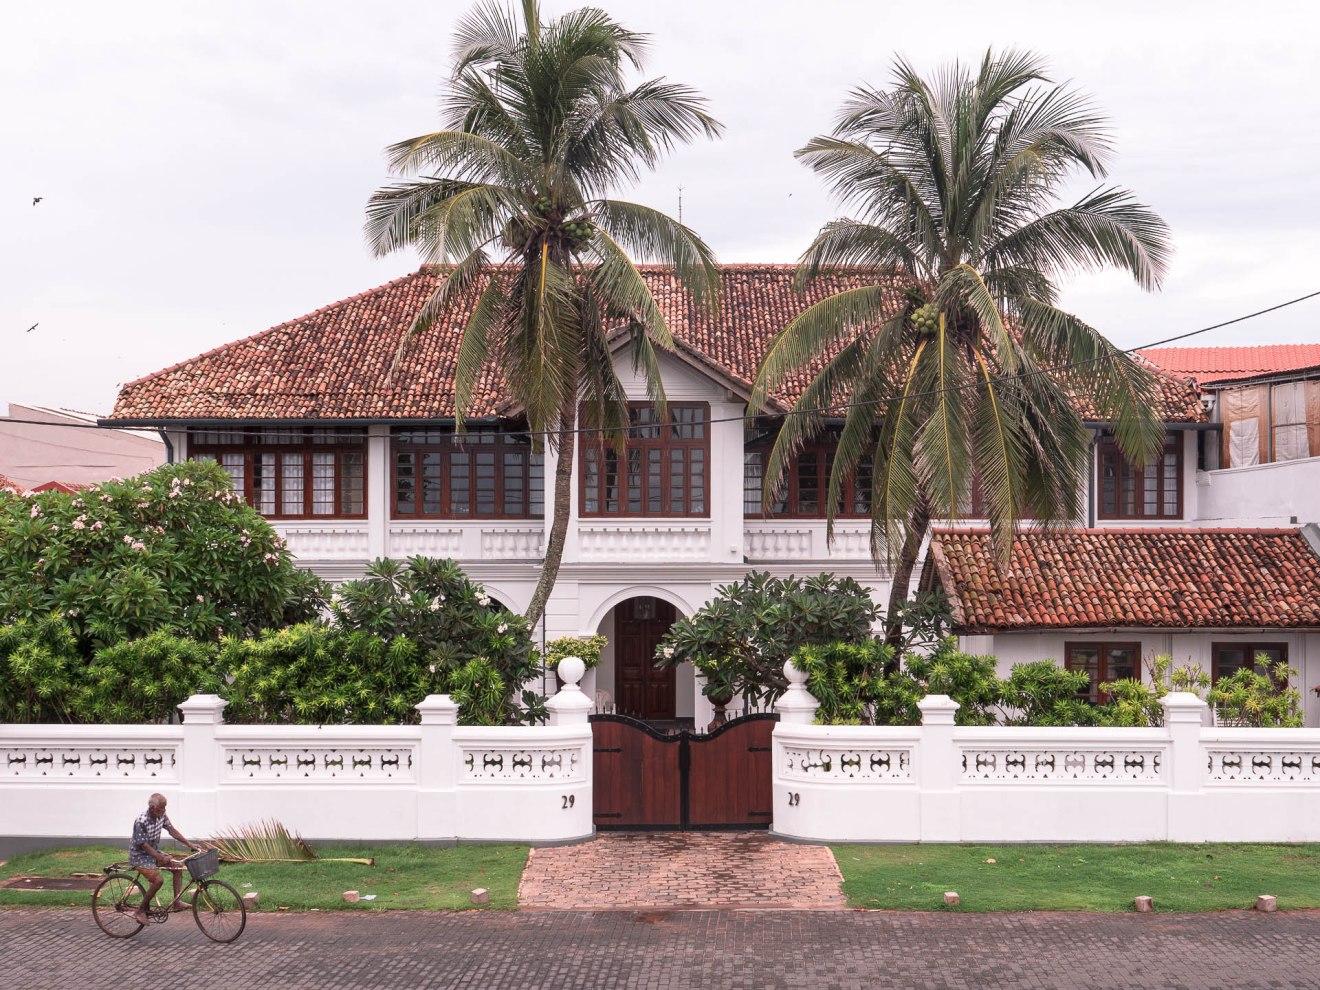 maison coloniale galle Sri lanka